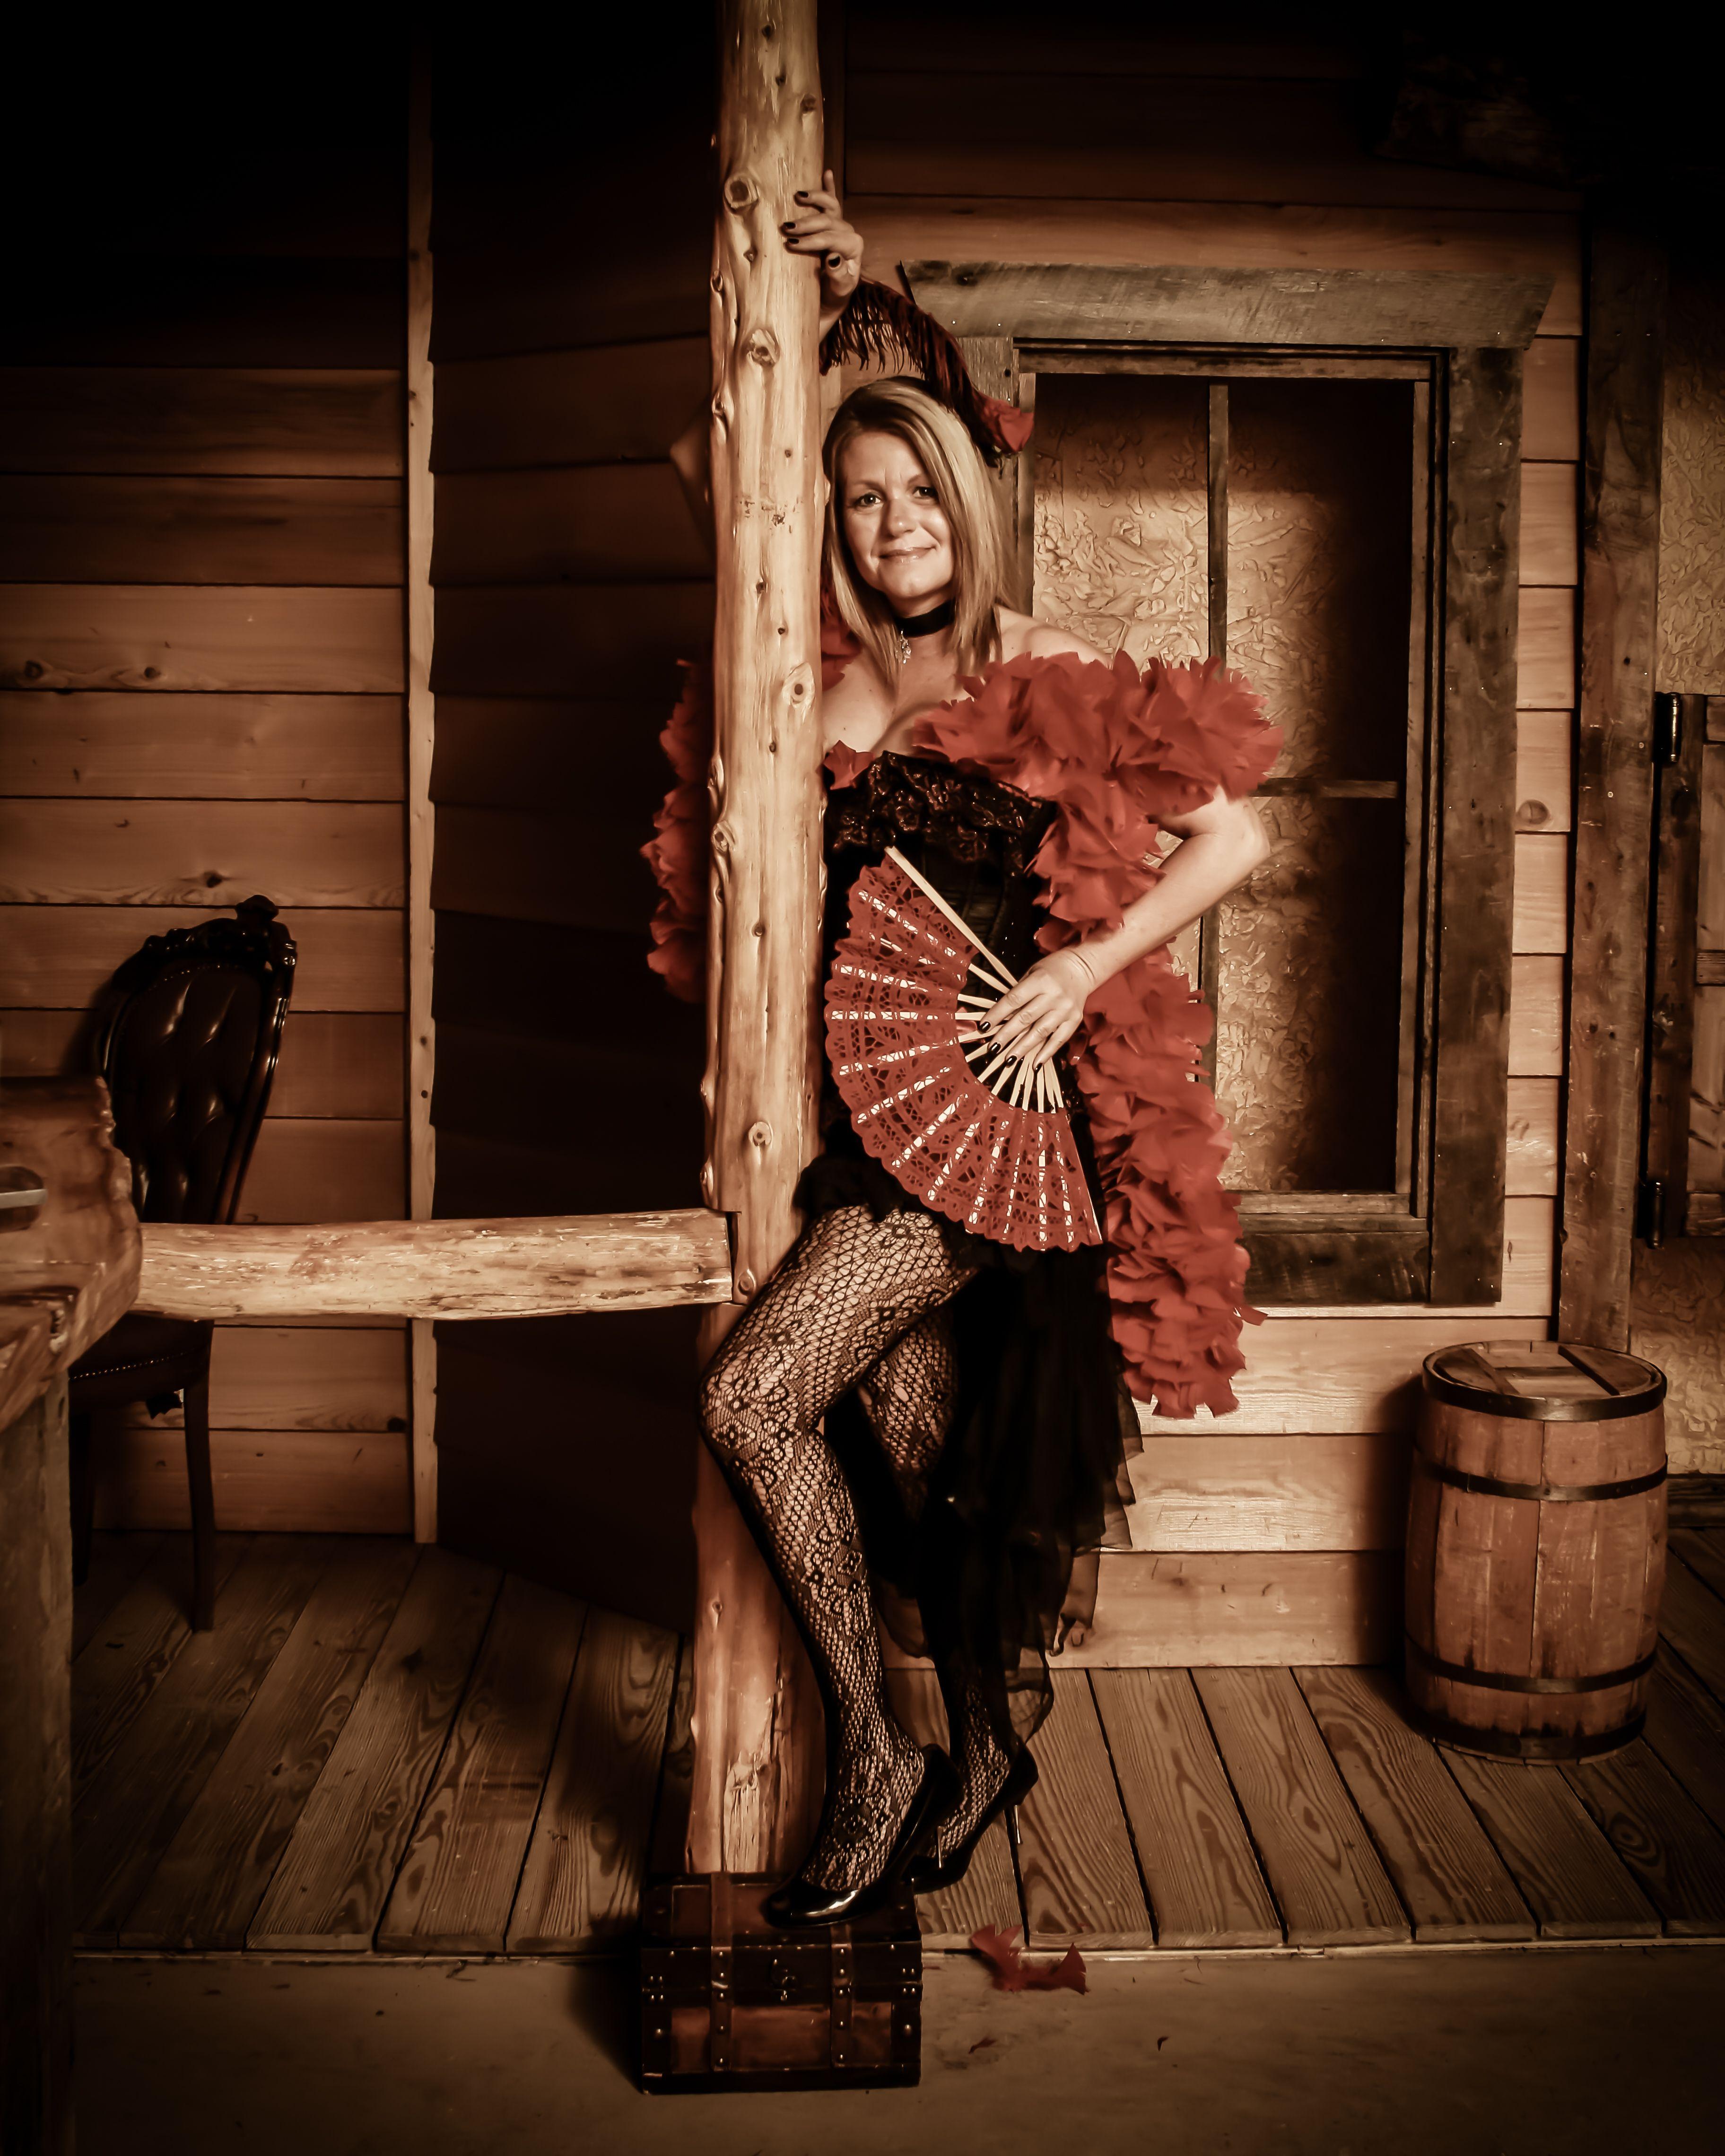 saloon-girl-sex-leather-pants-stars-xxx